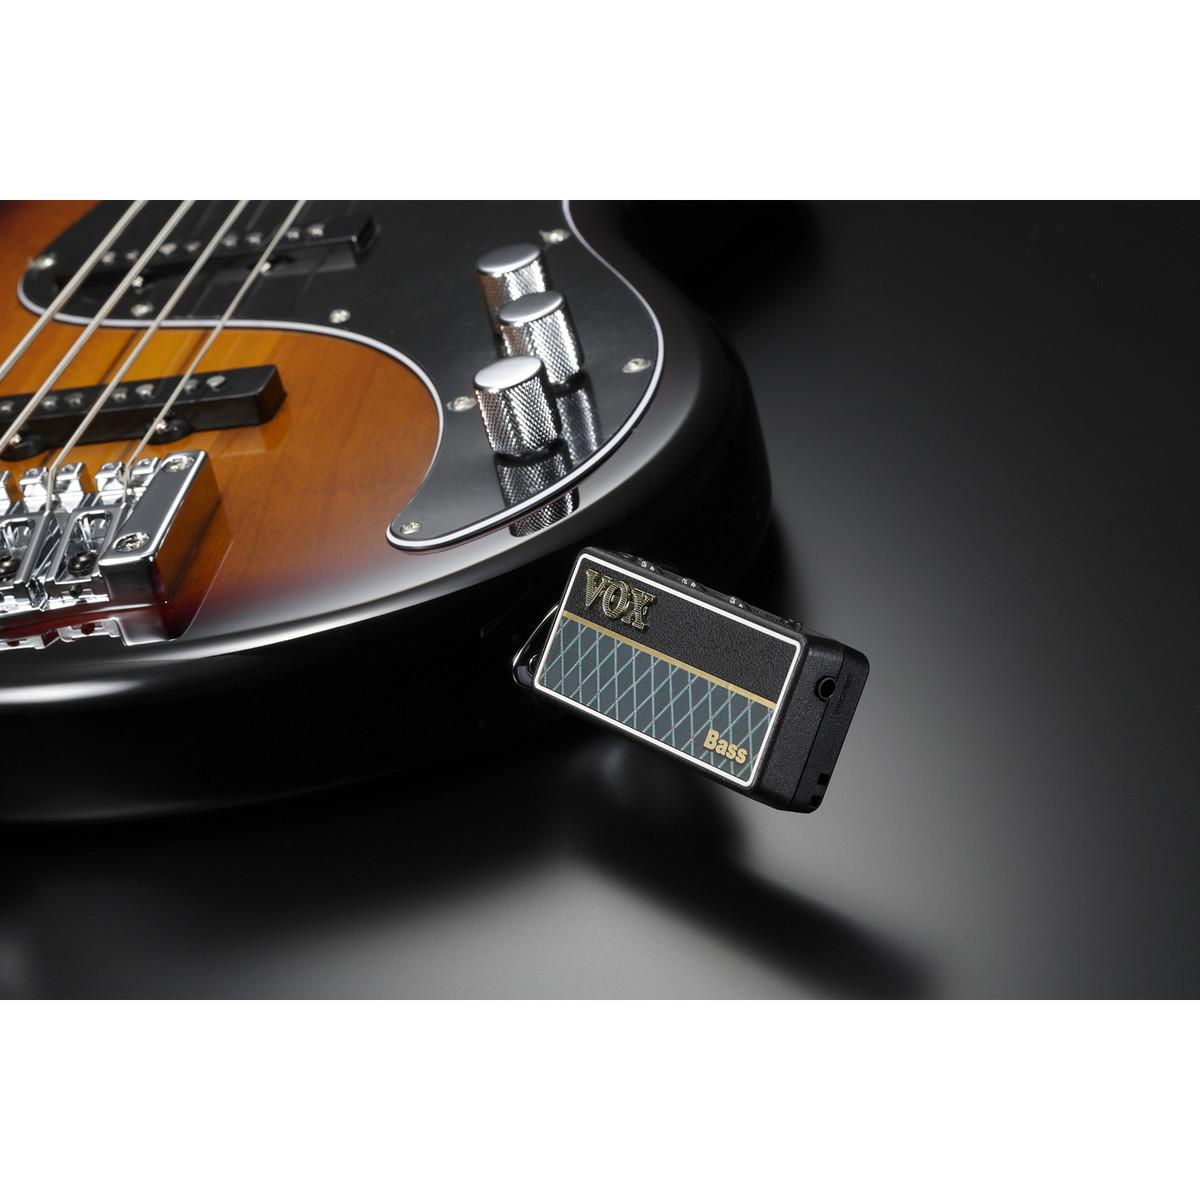 vox amplug 2 guitar headphone amp bass at. Black Bedroom Furniture Sets. Home Design Ideas